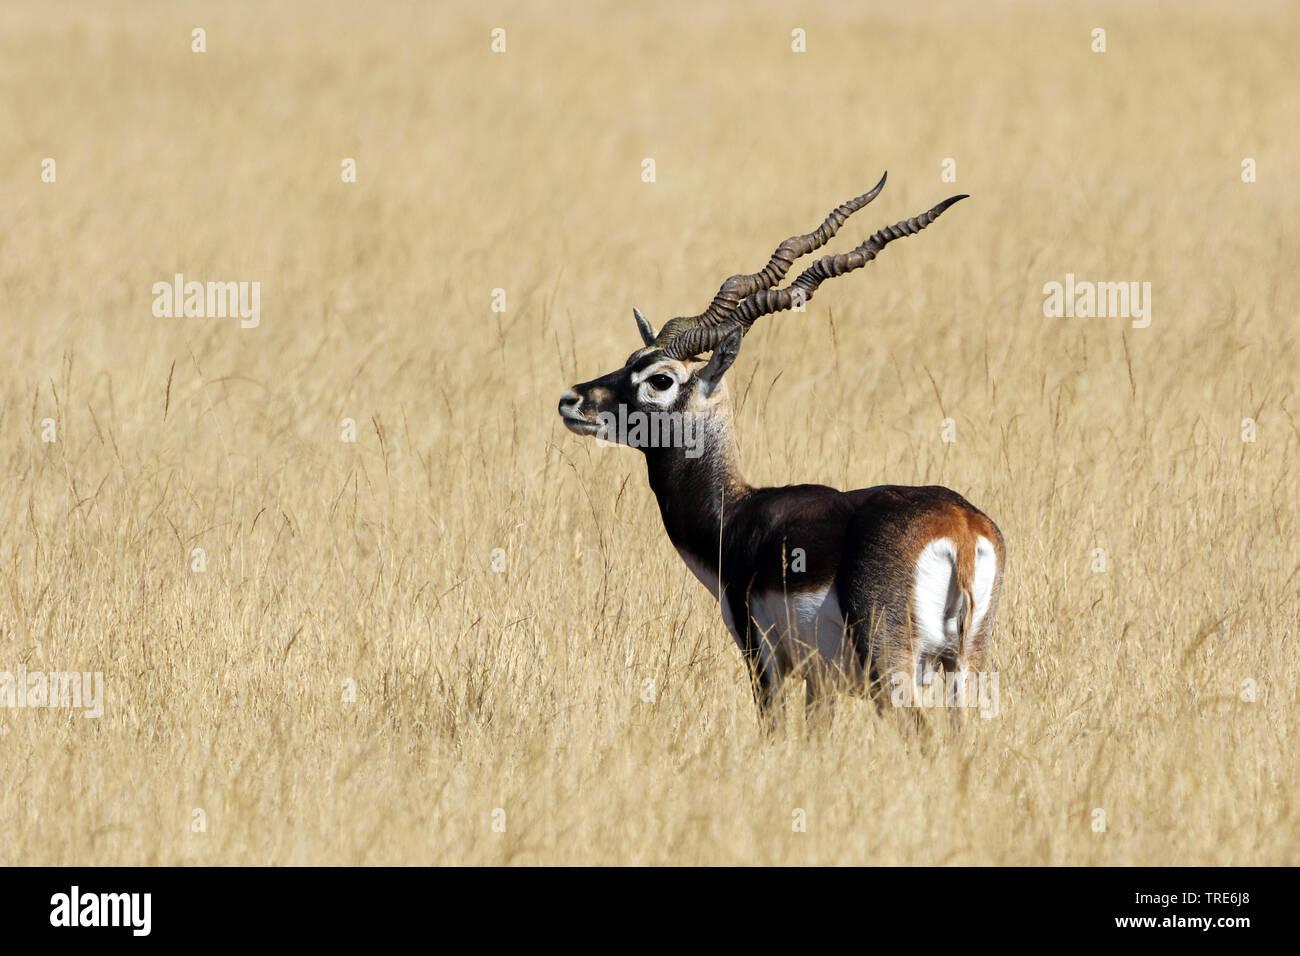 Hirschziegenantilope, Hirschziegen-Antilope (Antilope cervicapra), Bock e in der Savanne, Indien, Tal Chhapar | Hirschziegenantilope (Antilope cervicapra), b Stockbild